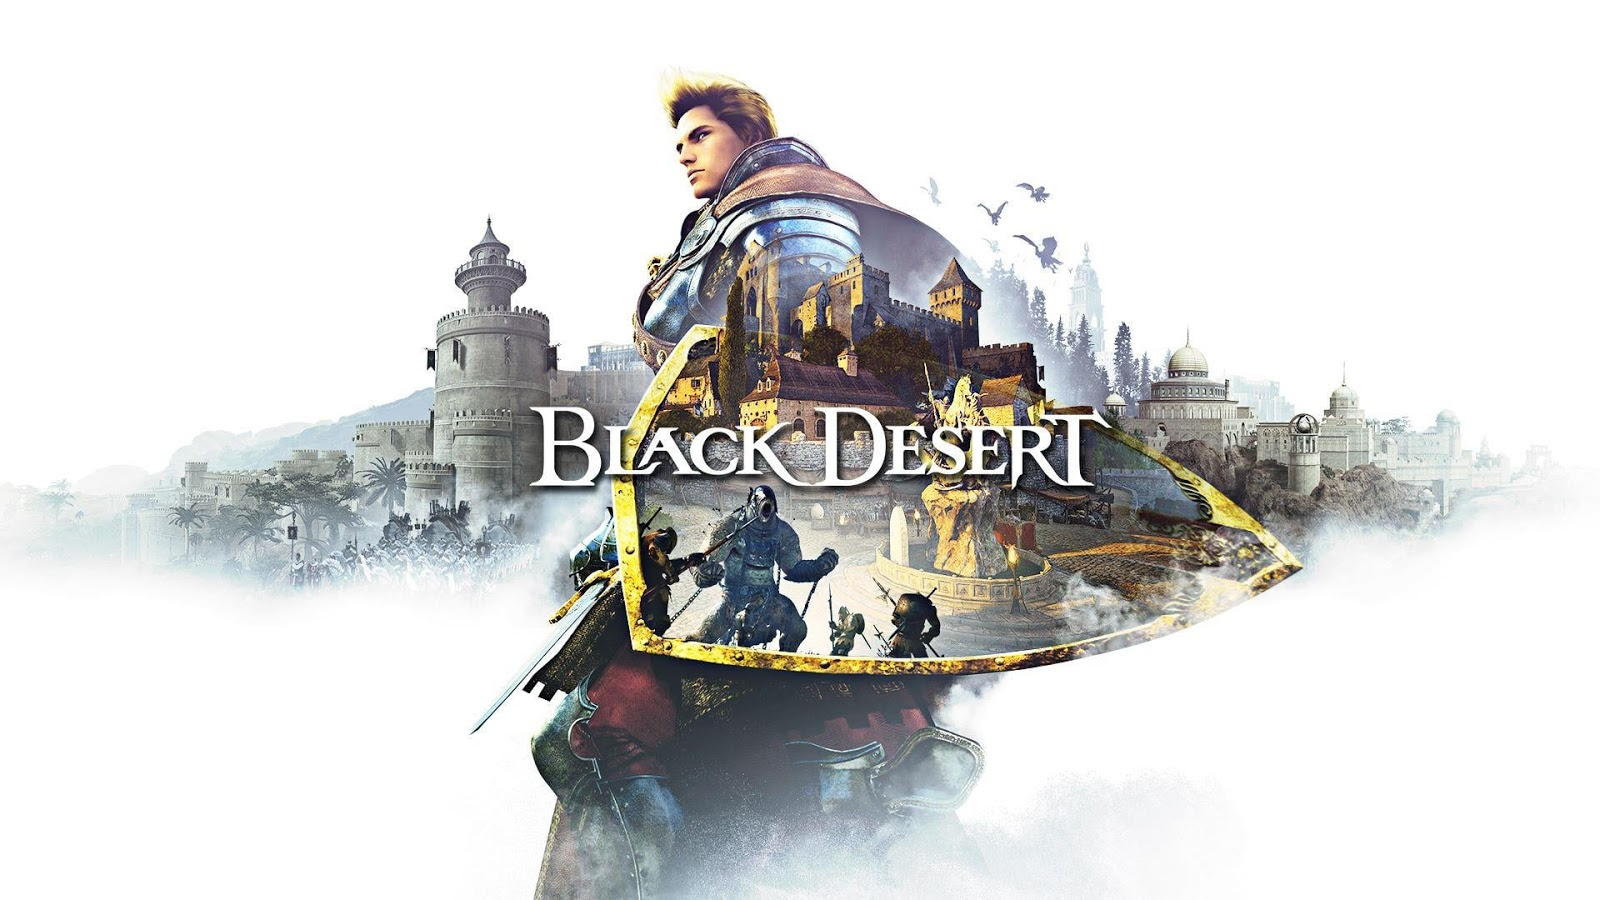 Black Desert Online coming to PS4 in 2019, pre-orders start